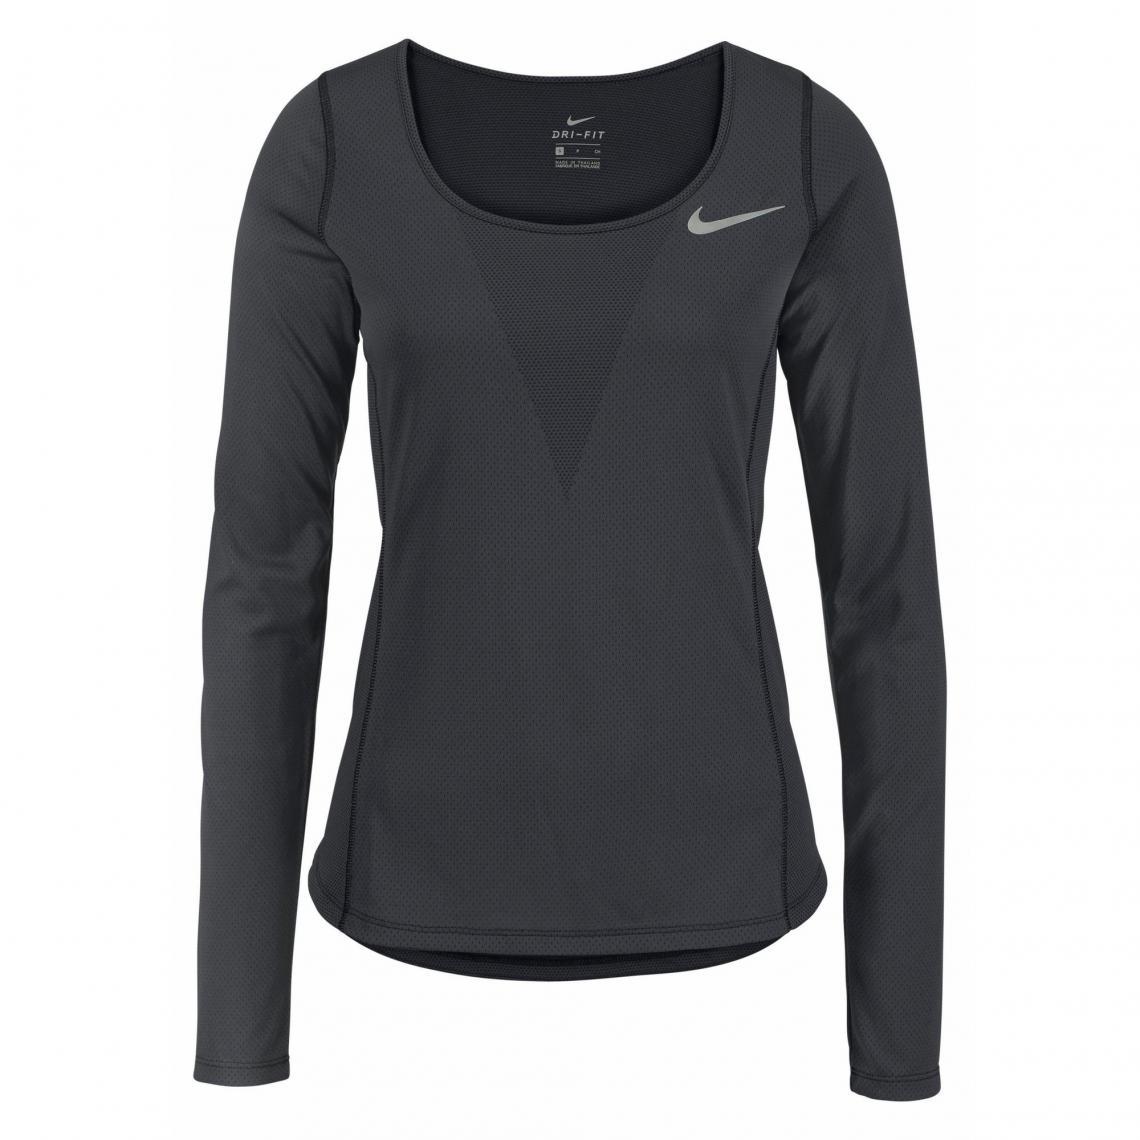 Znl De Manches Shirt Relay Femme Sport Dri Classic Longues Tee Fit Zw867